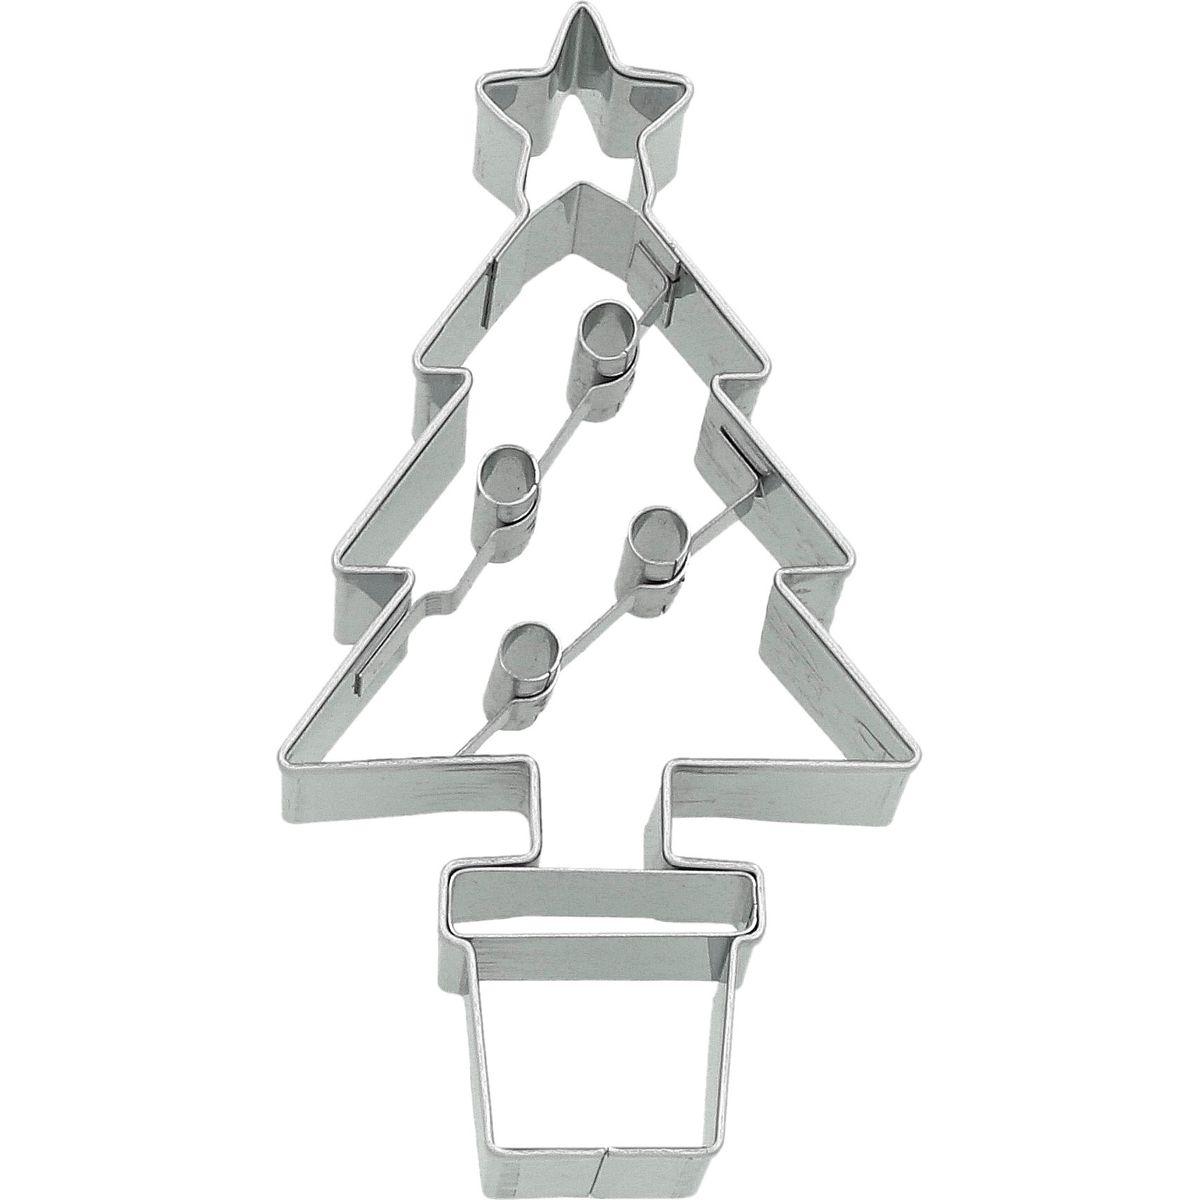 Emporte-pièce en inox sapin de Noël 8.5 cm - Birkmann